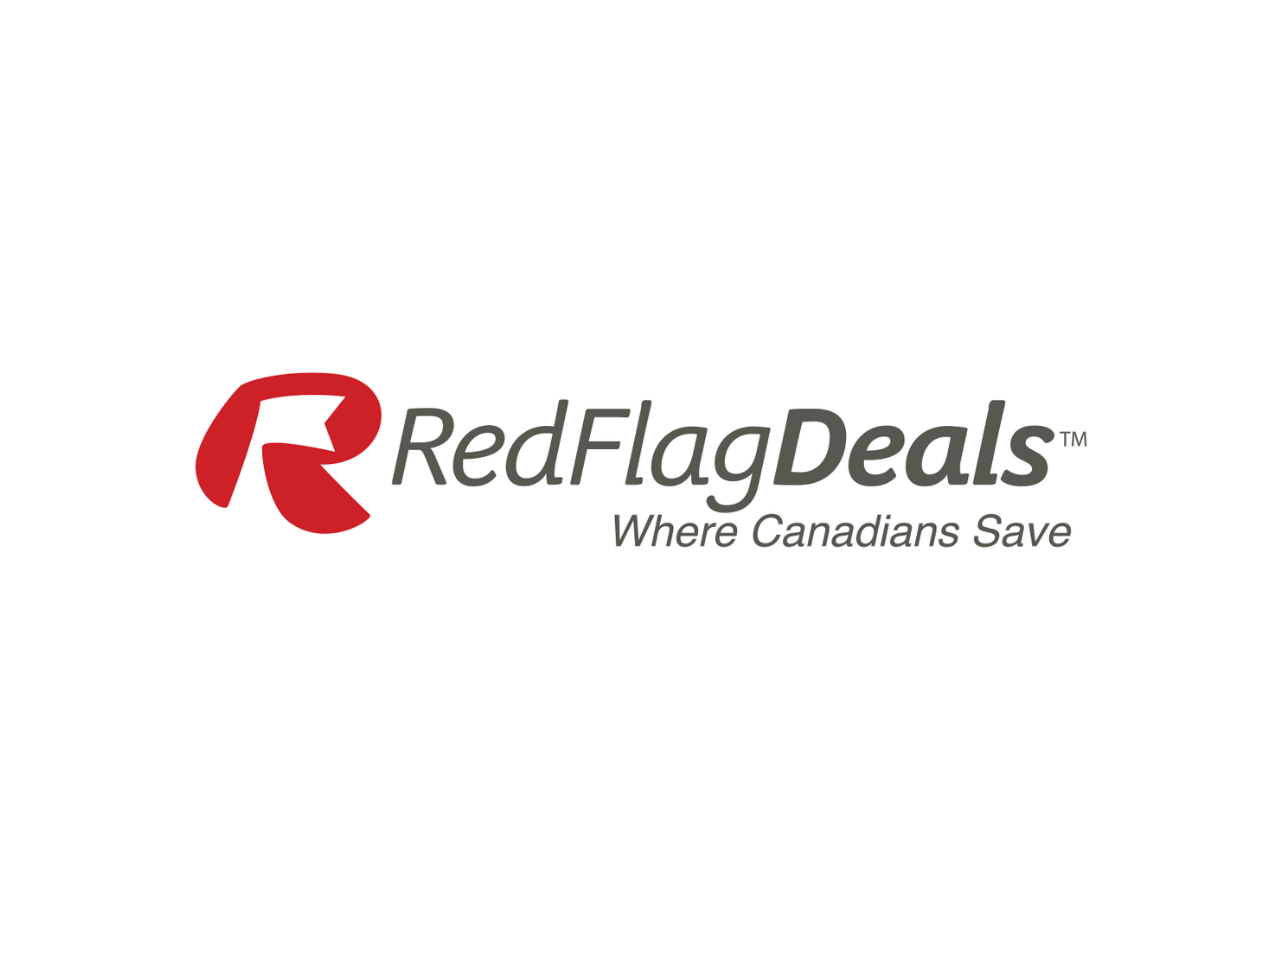 RedFlagDeals Review